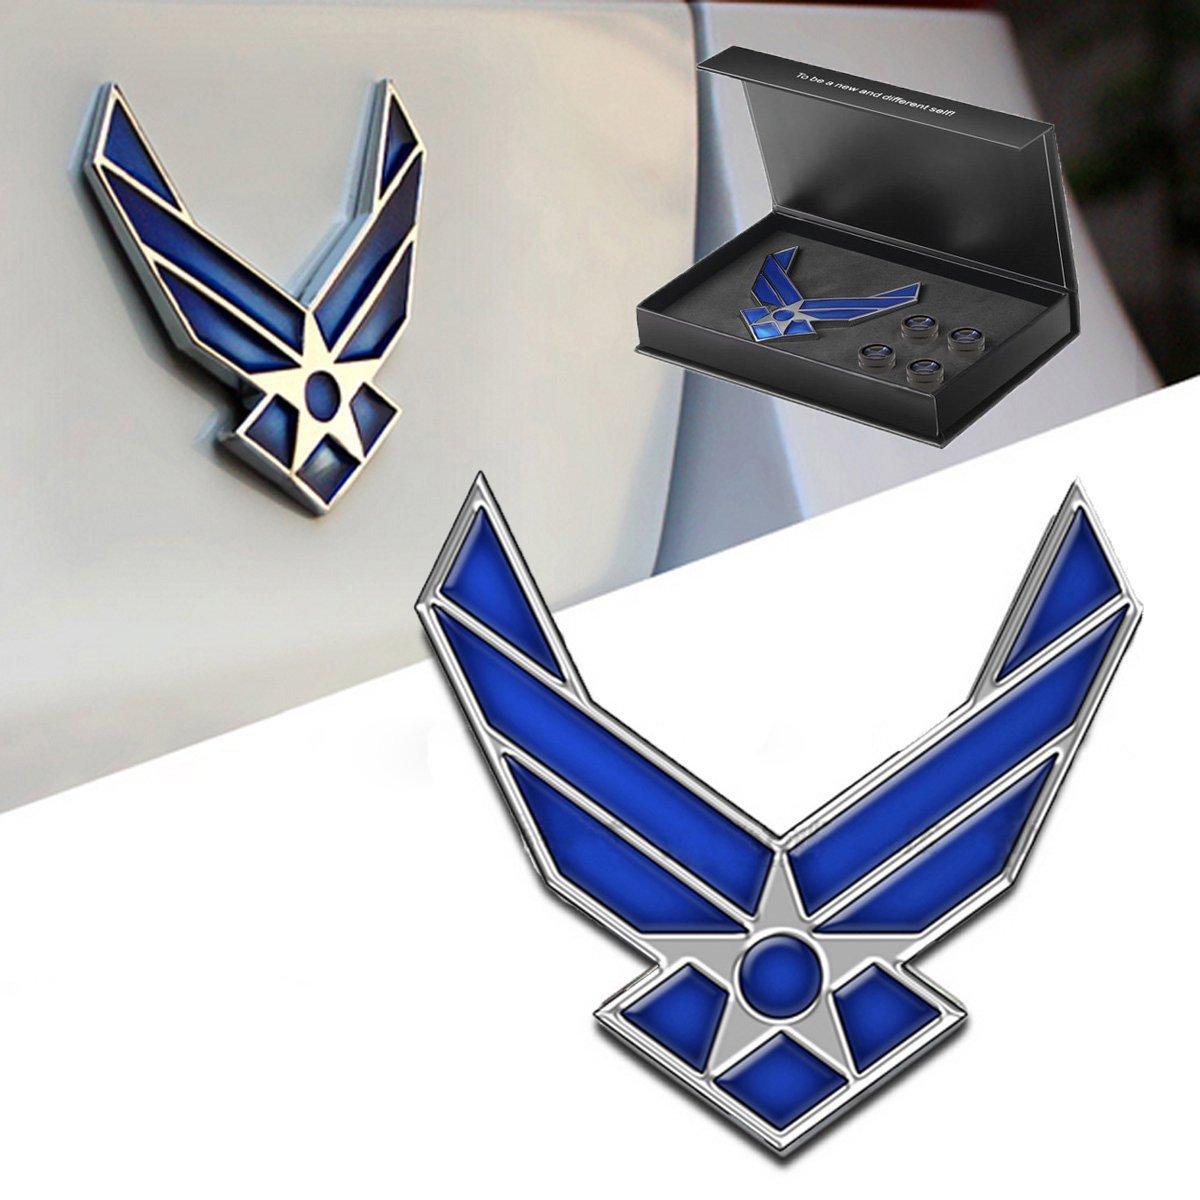 DSYCAR 3D Metal US Air Force Logo Car Stickers Emblem Badge Decals for Car Styling DIY Decoration Accessories - Blue - 4 Free Valve Stem Cap 9527 US Air Force Premium Emblem